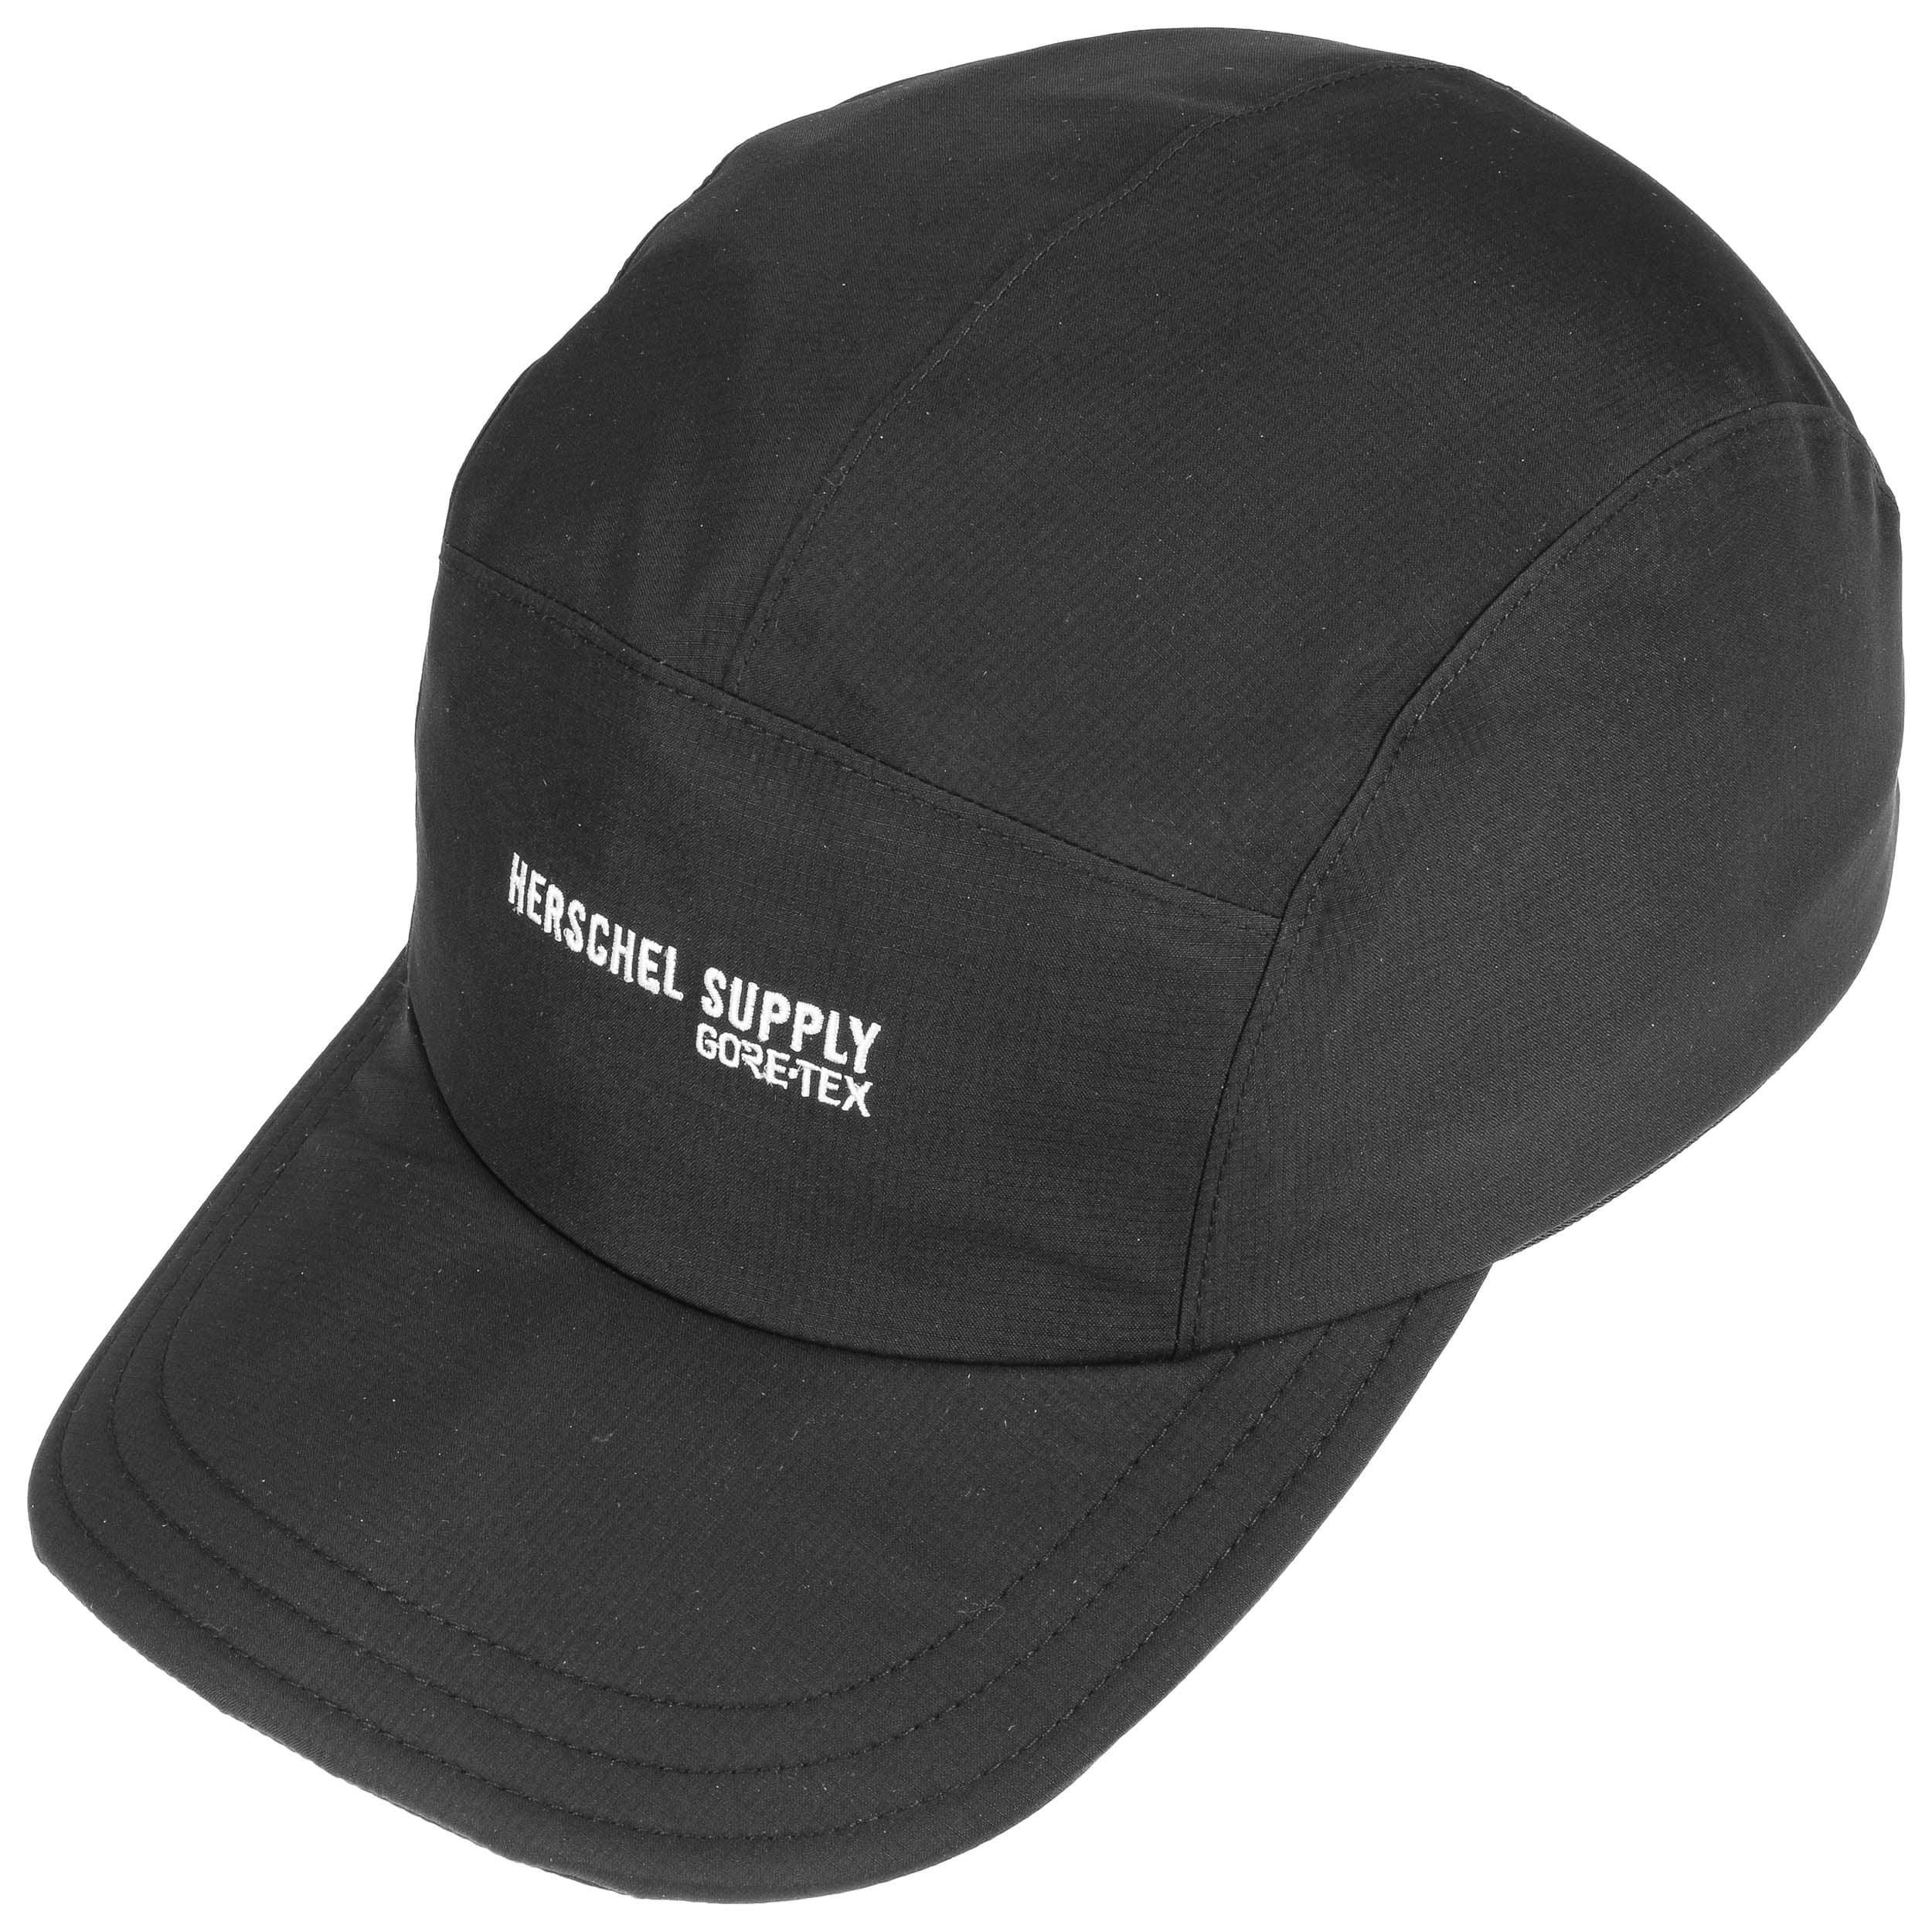 Glendale Gore-Tex Cap by Herschel - black 1 ... 392dbdb8b836